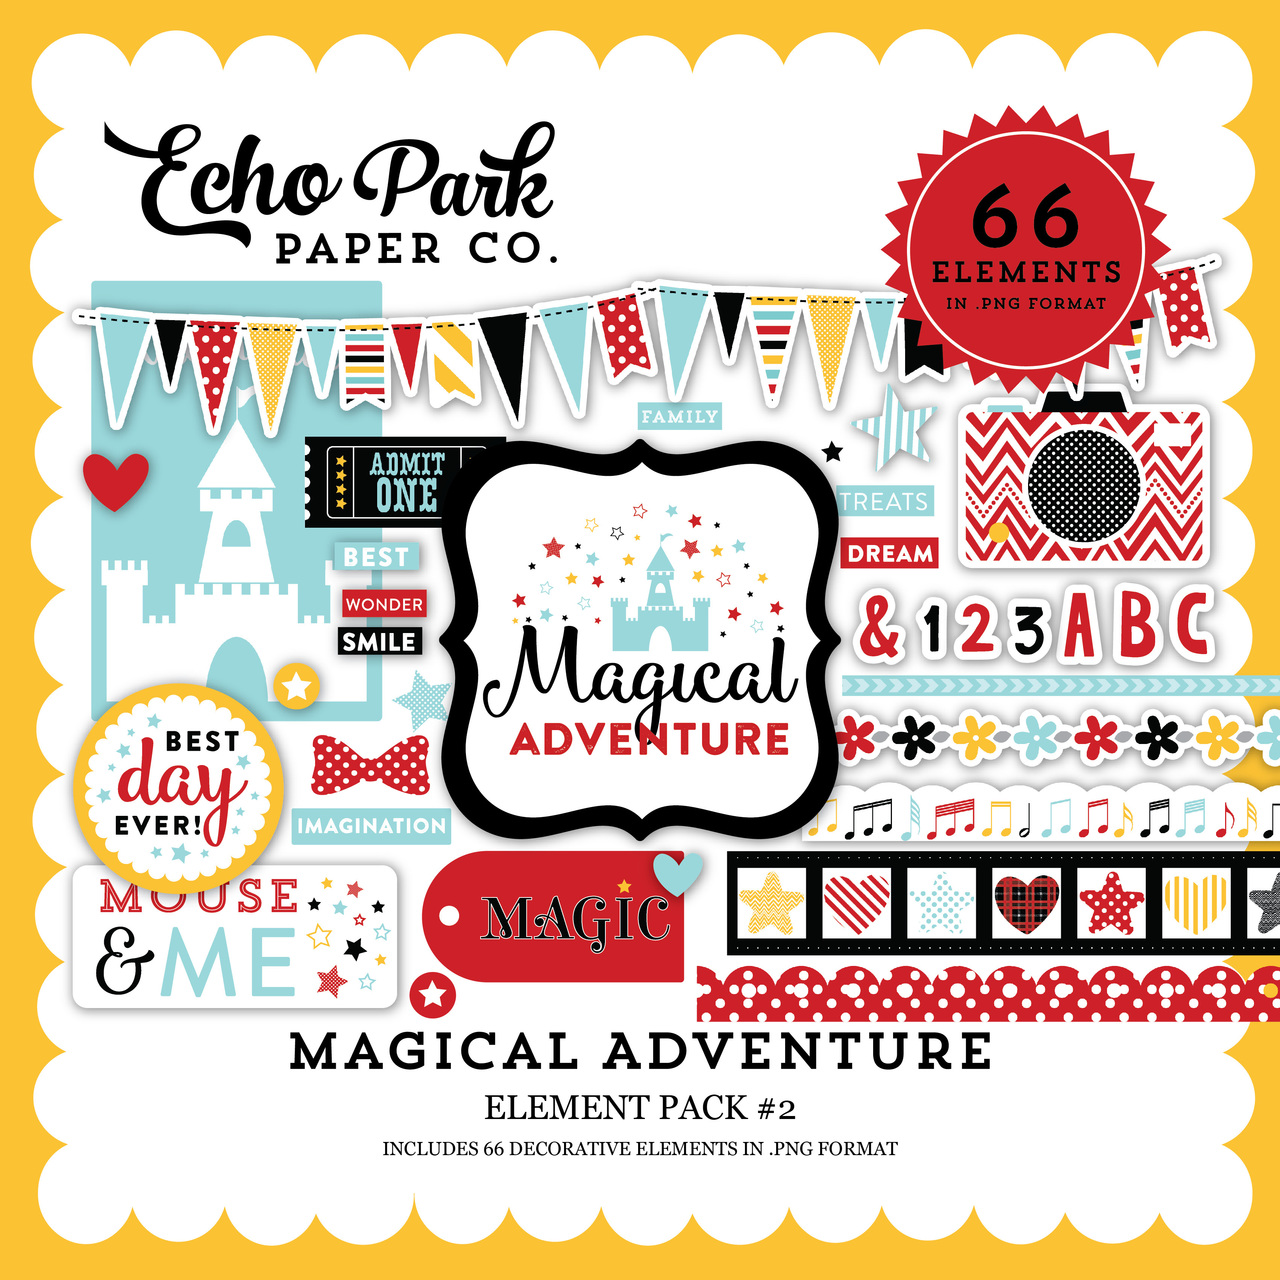 Magical Adventure Element Pack #2